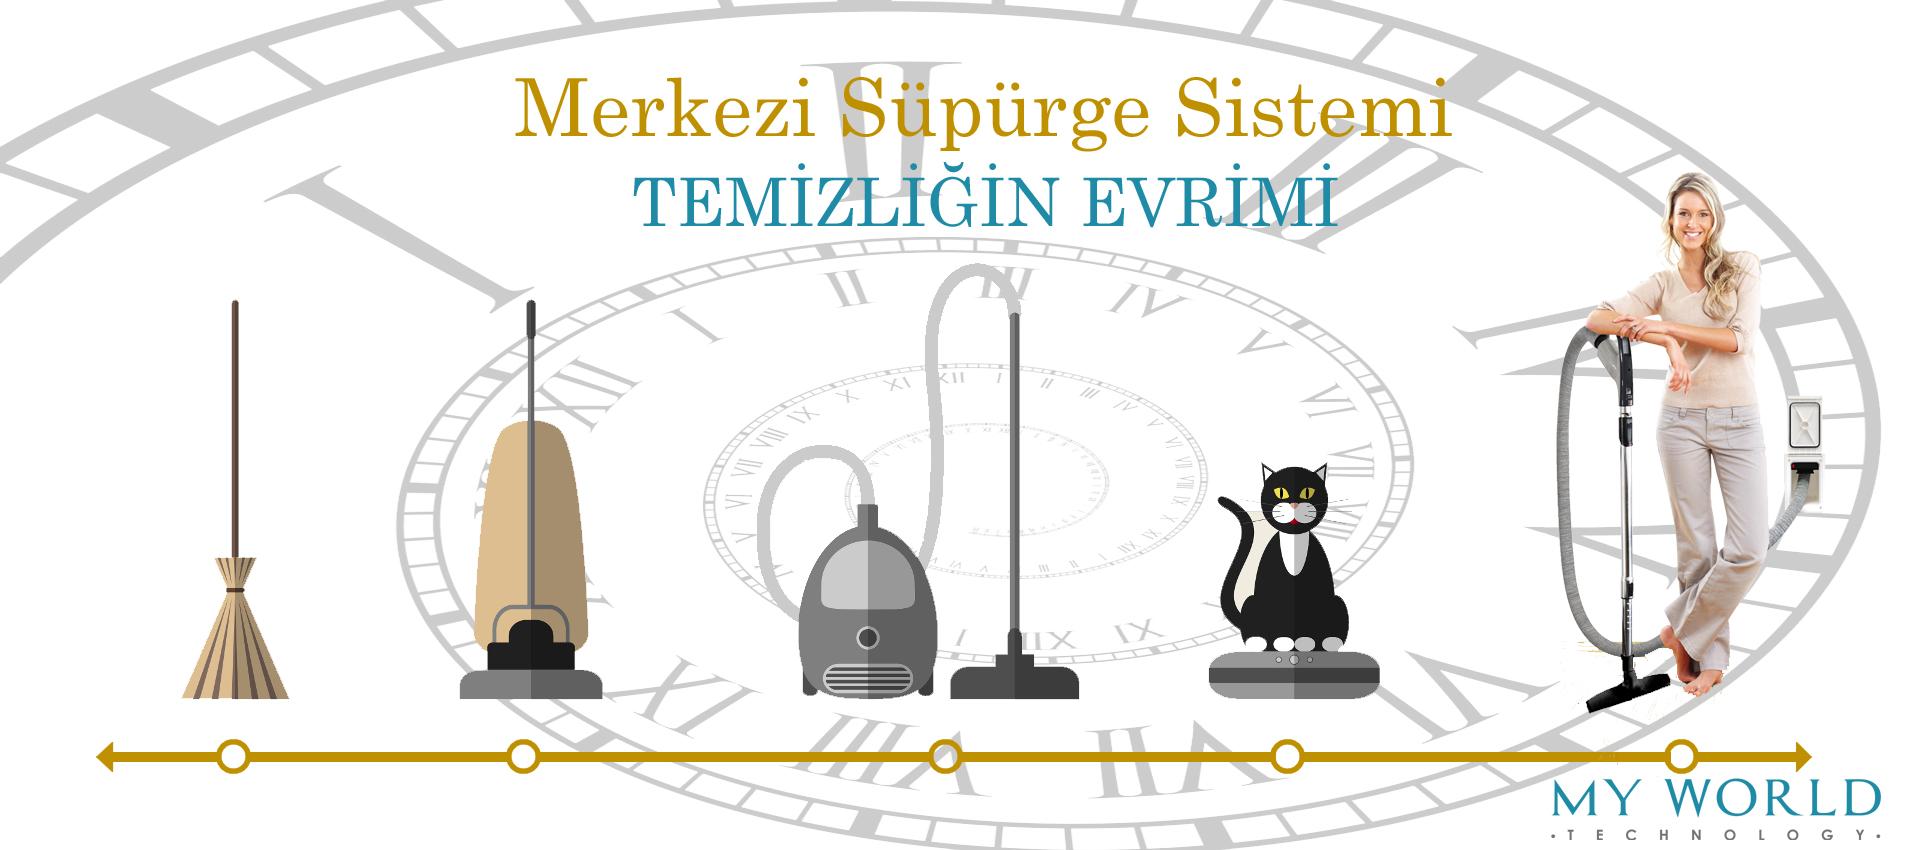 merkezi_süpürge_sistemi _my_world_teknoloji_bursa